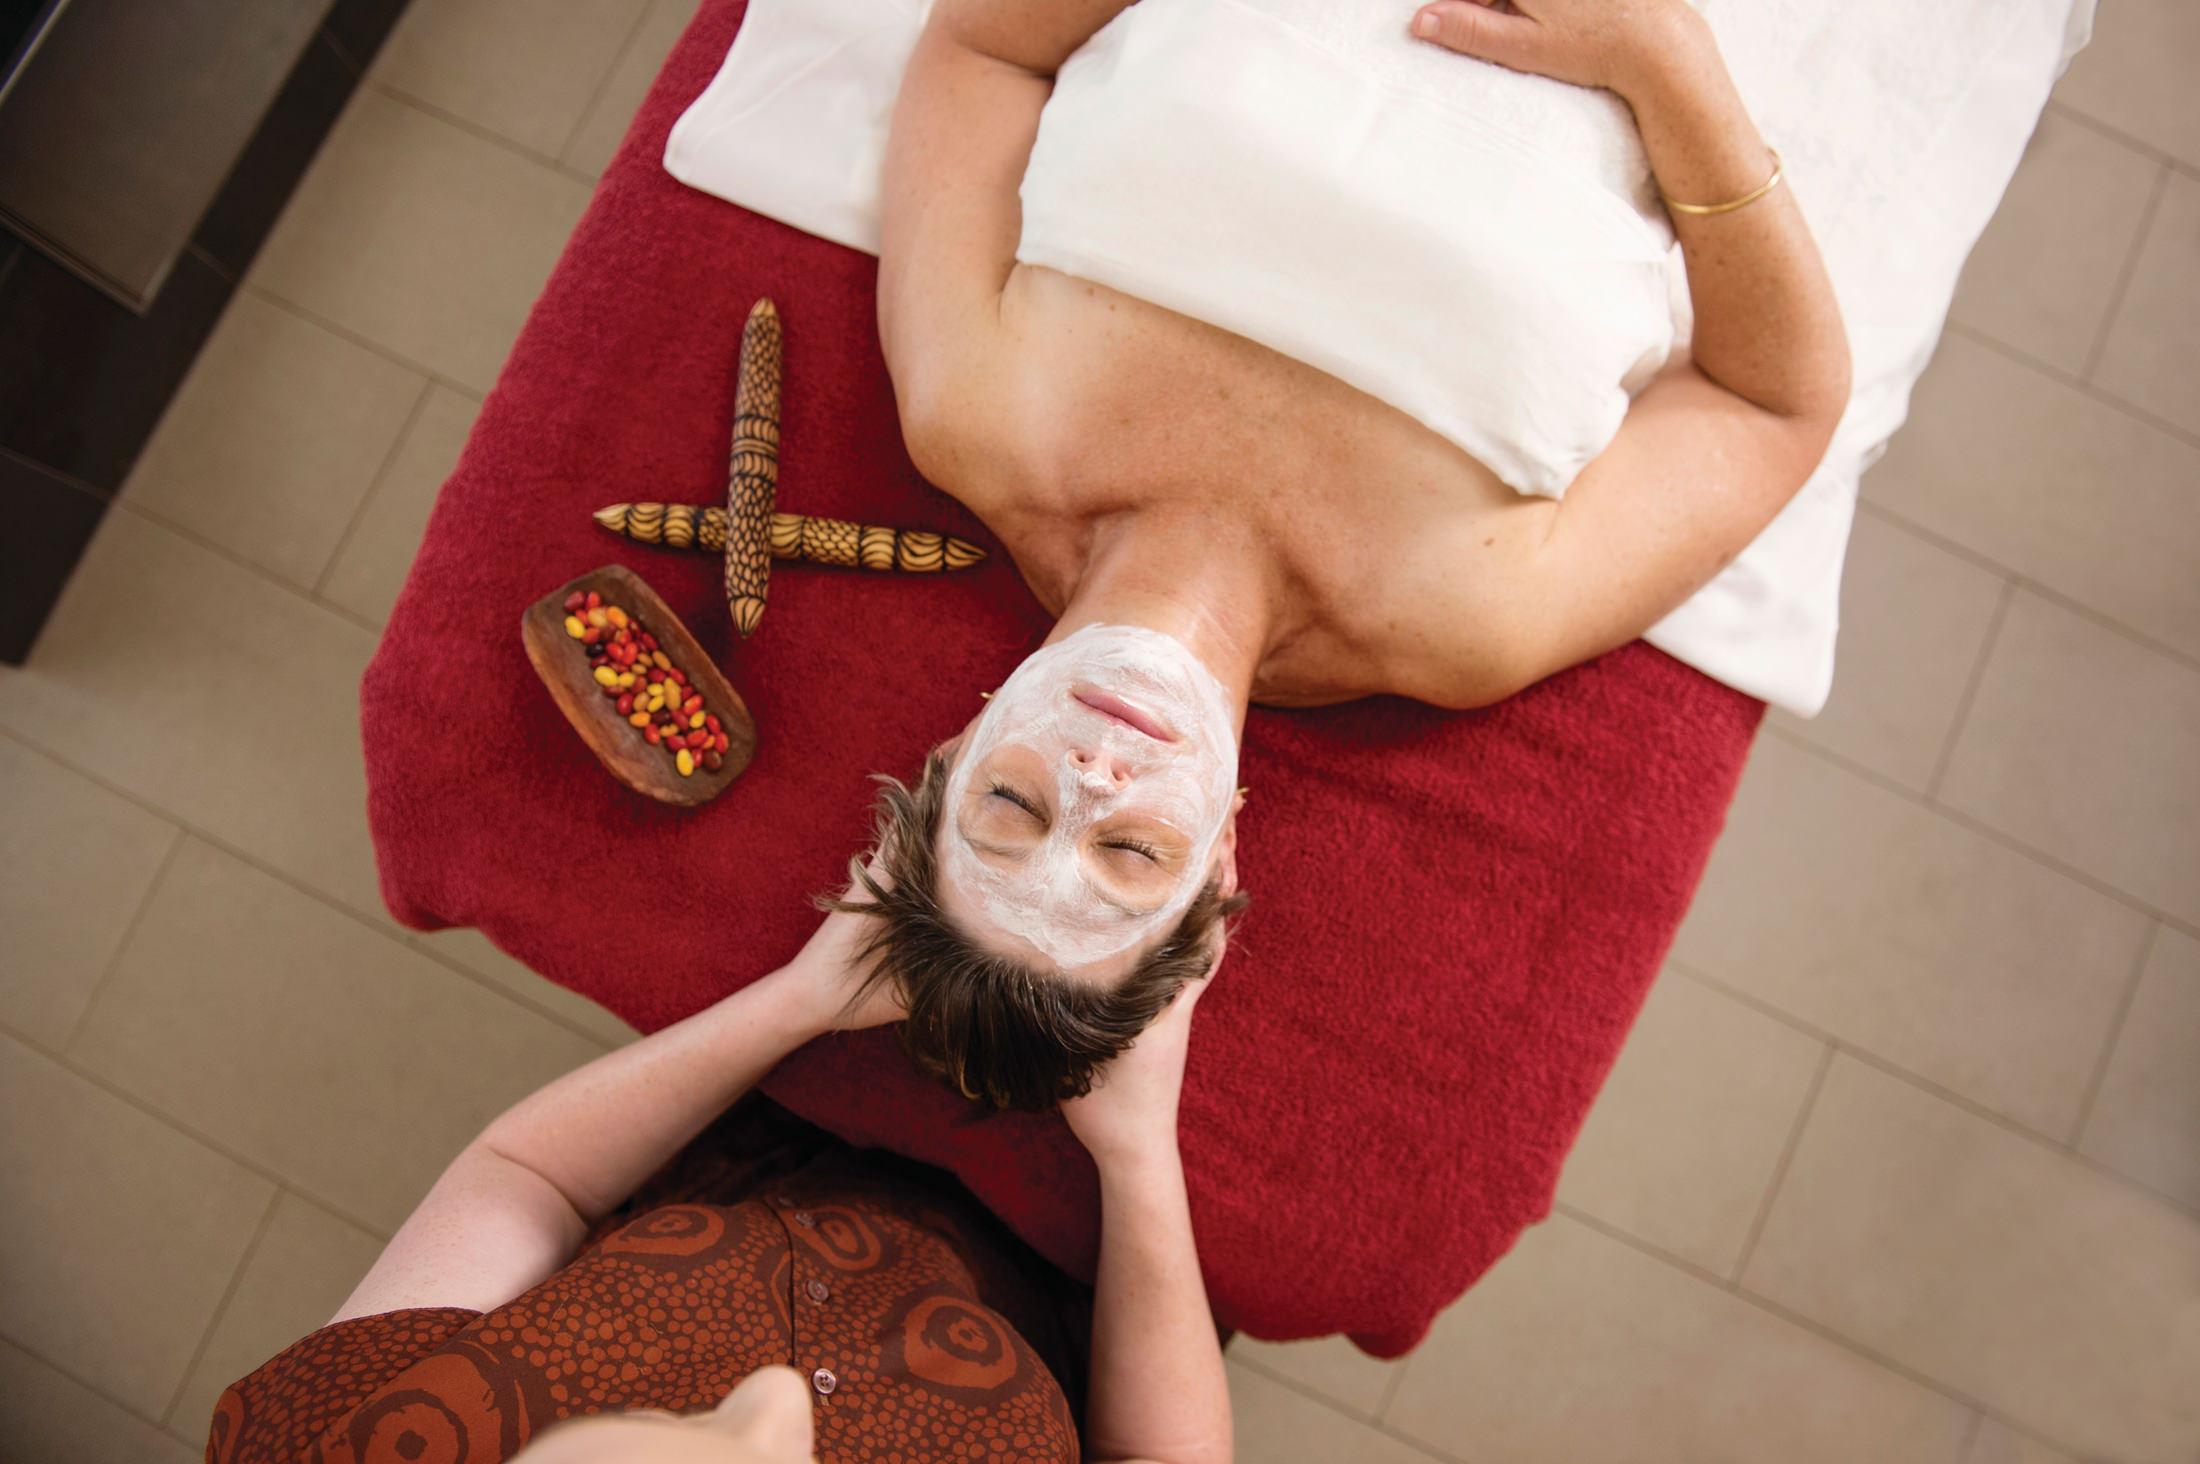 A woman enjoying a spa